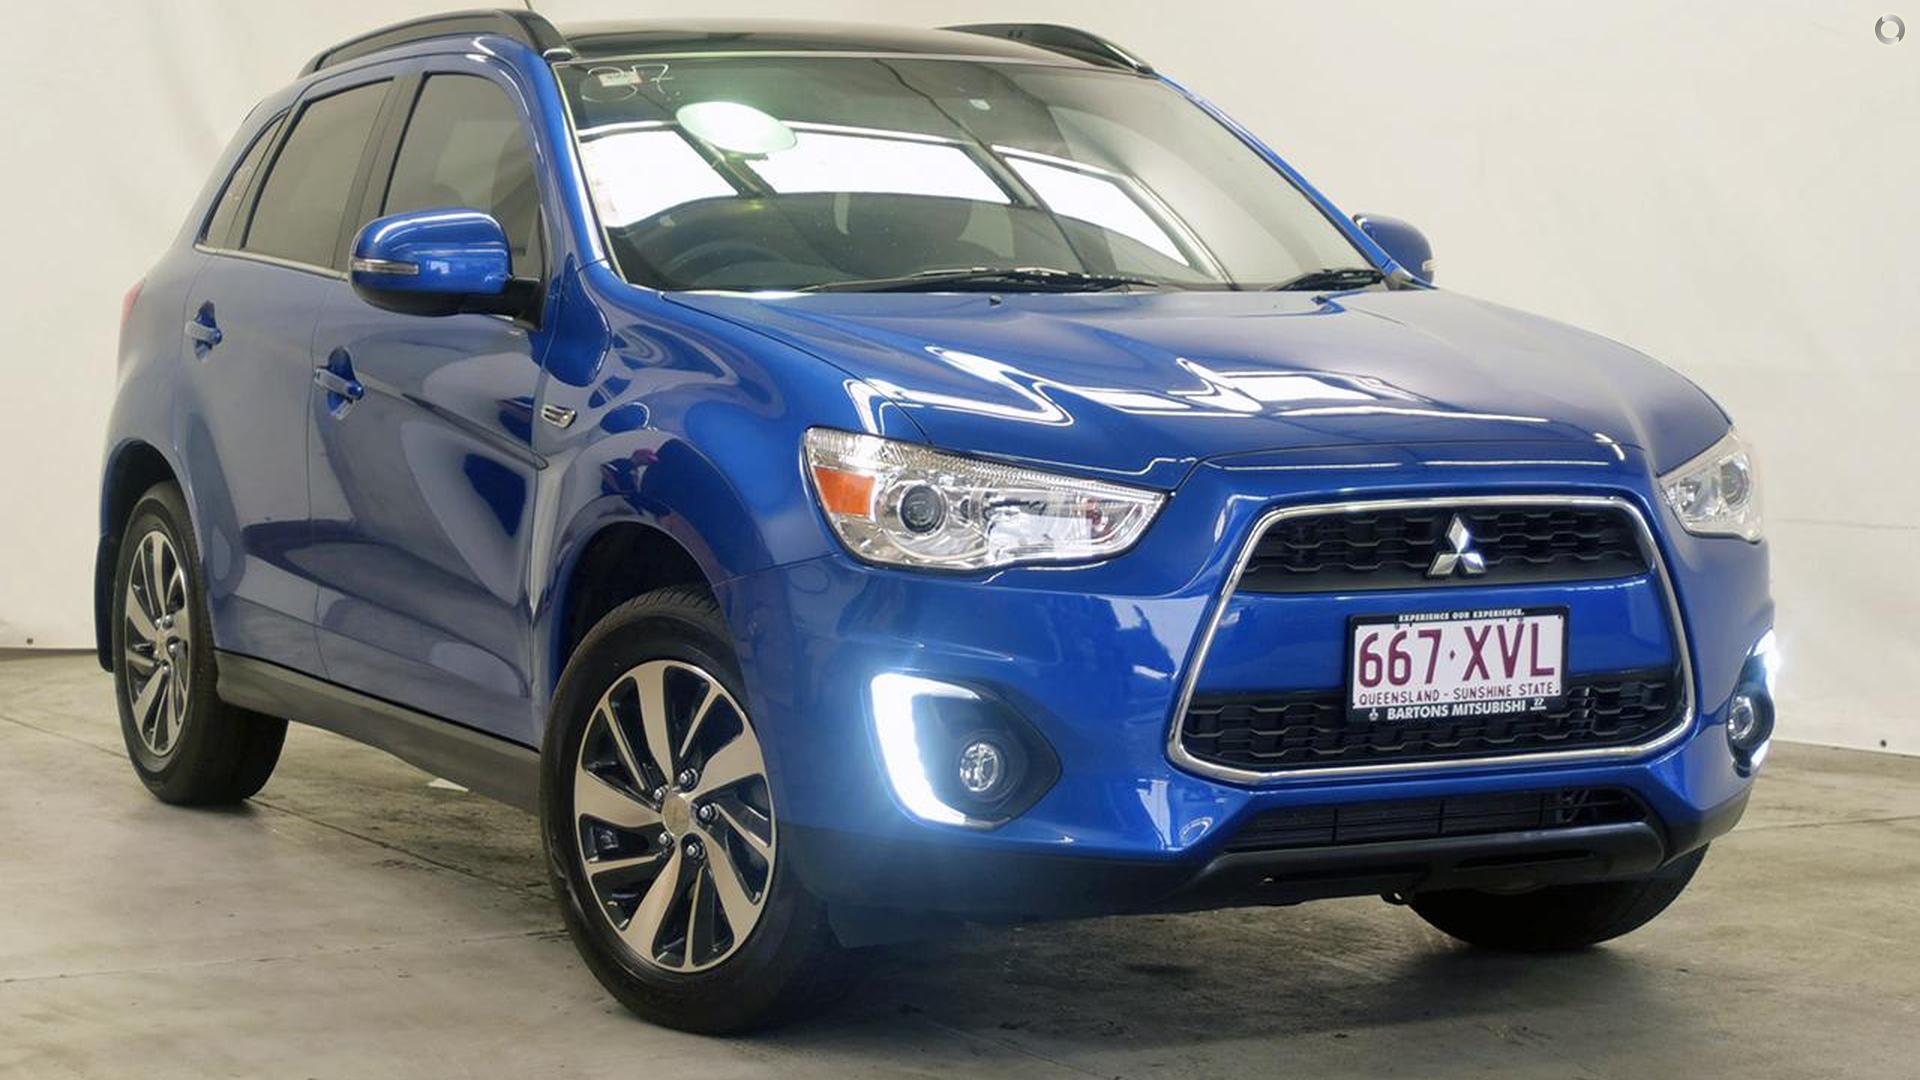 2014 Mitsubishi Asx Xls